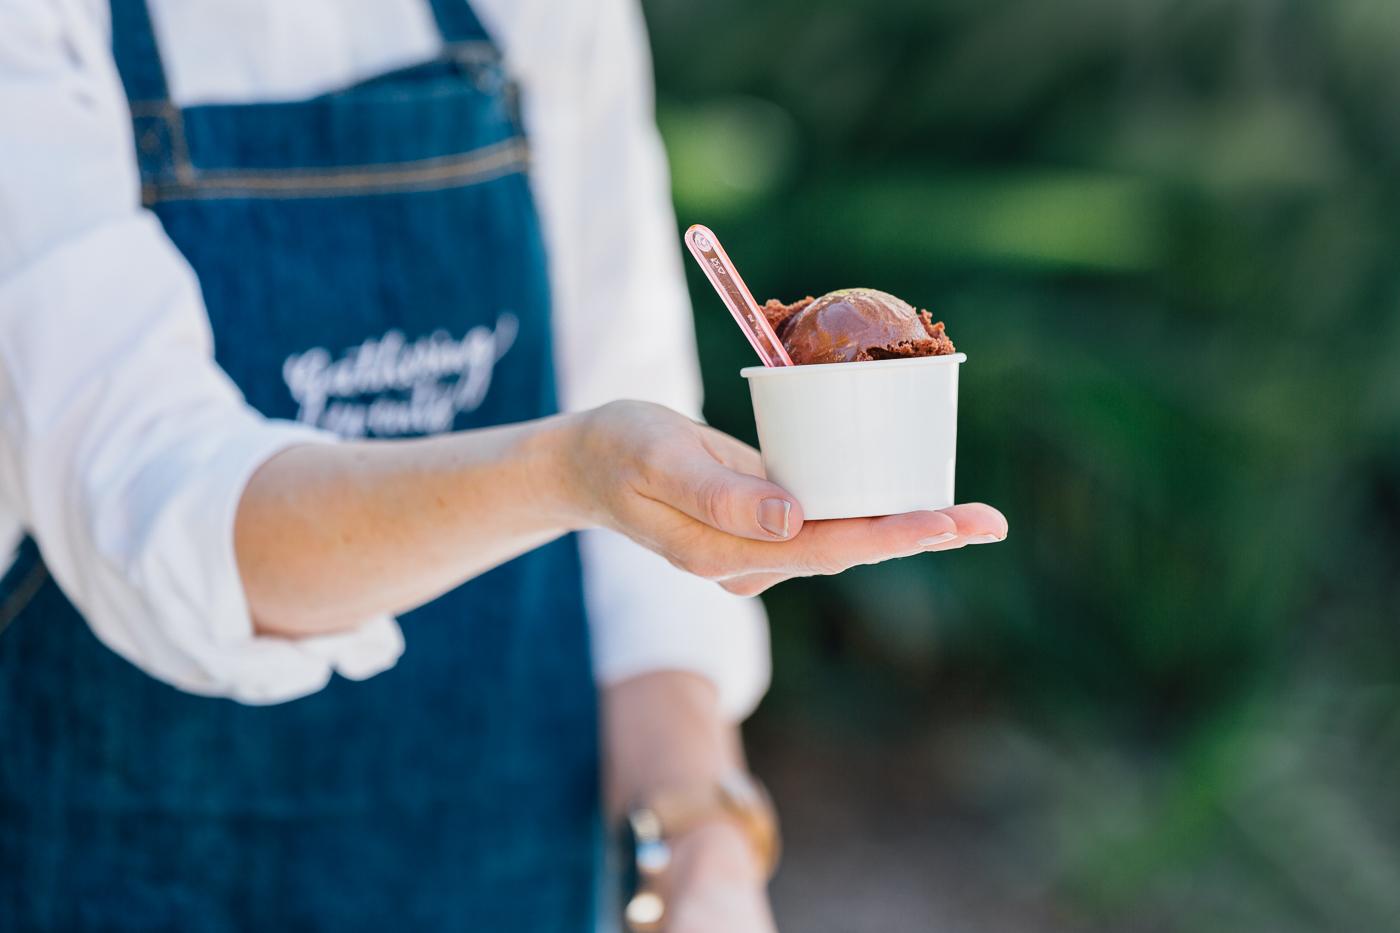 Italian Ice Cream - Product Launch - Cart